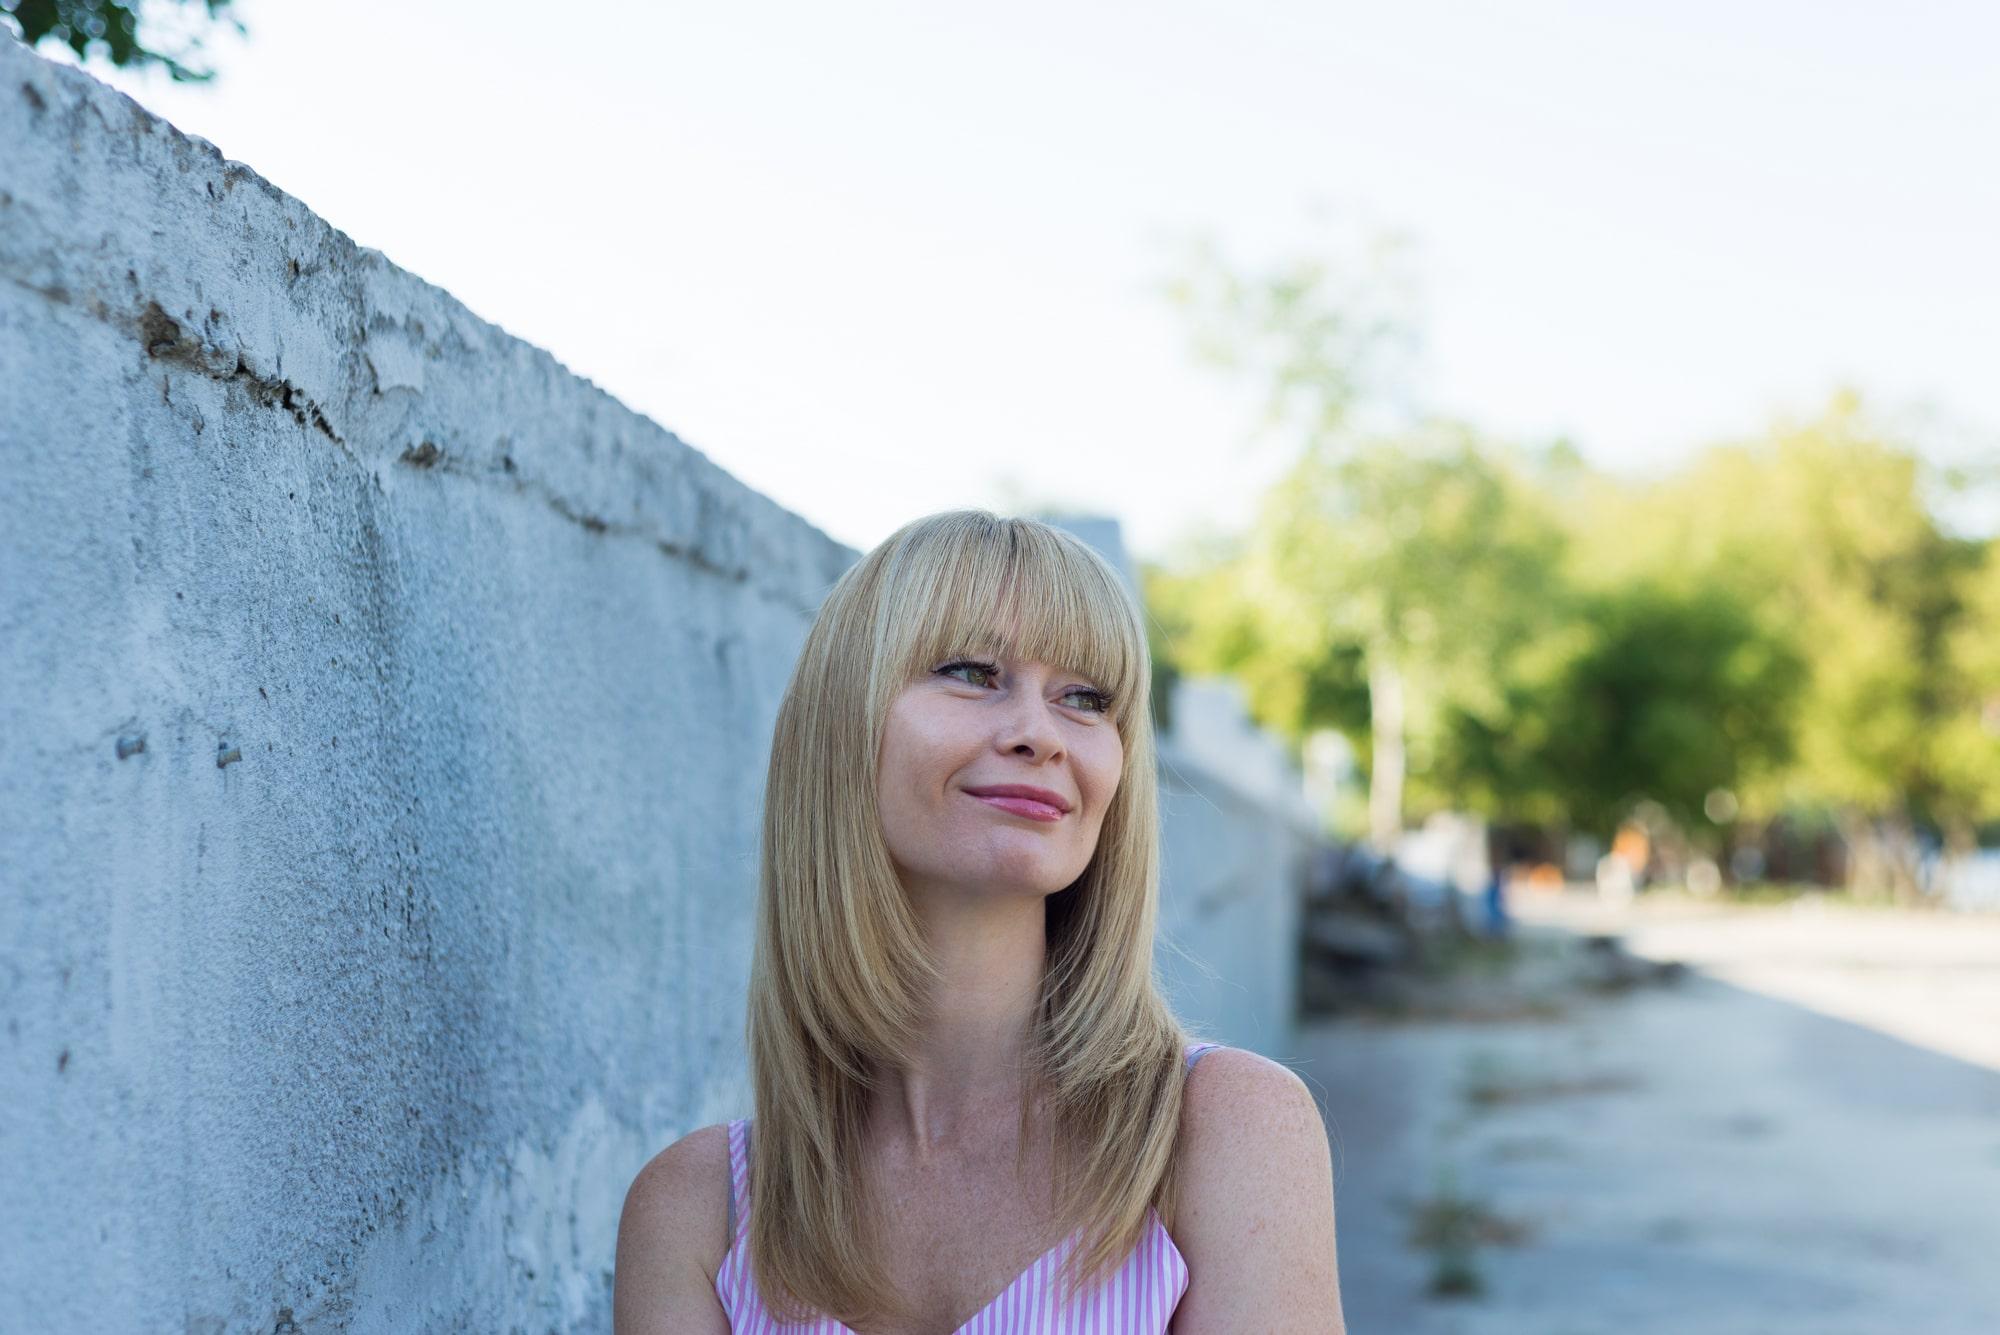 Фотосессия девушки возле реки Днепр - романтический взгляд